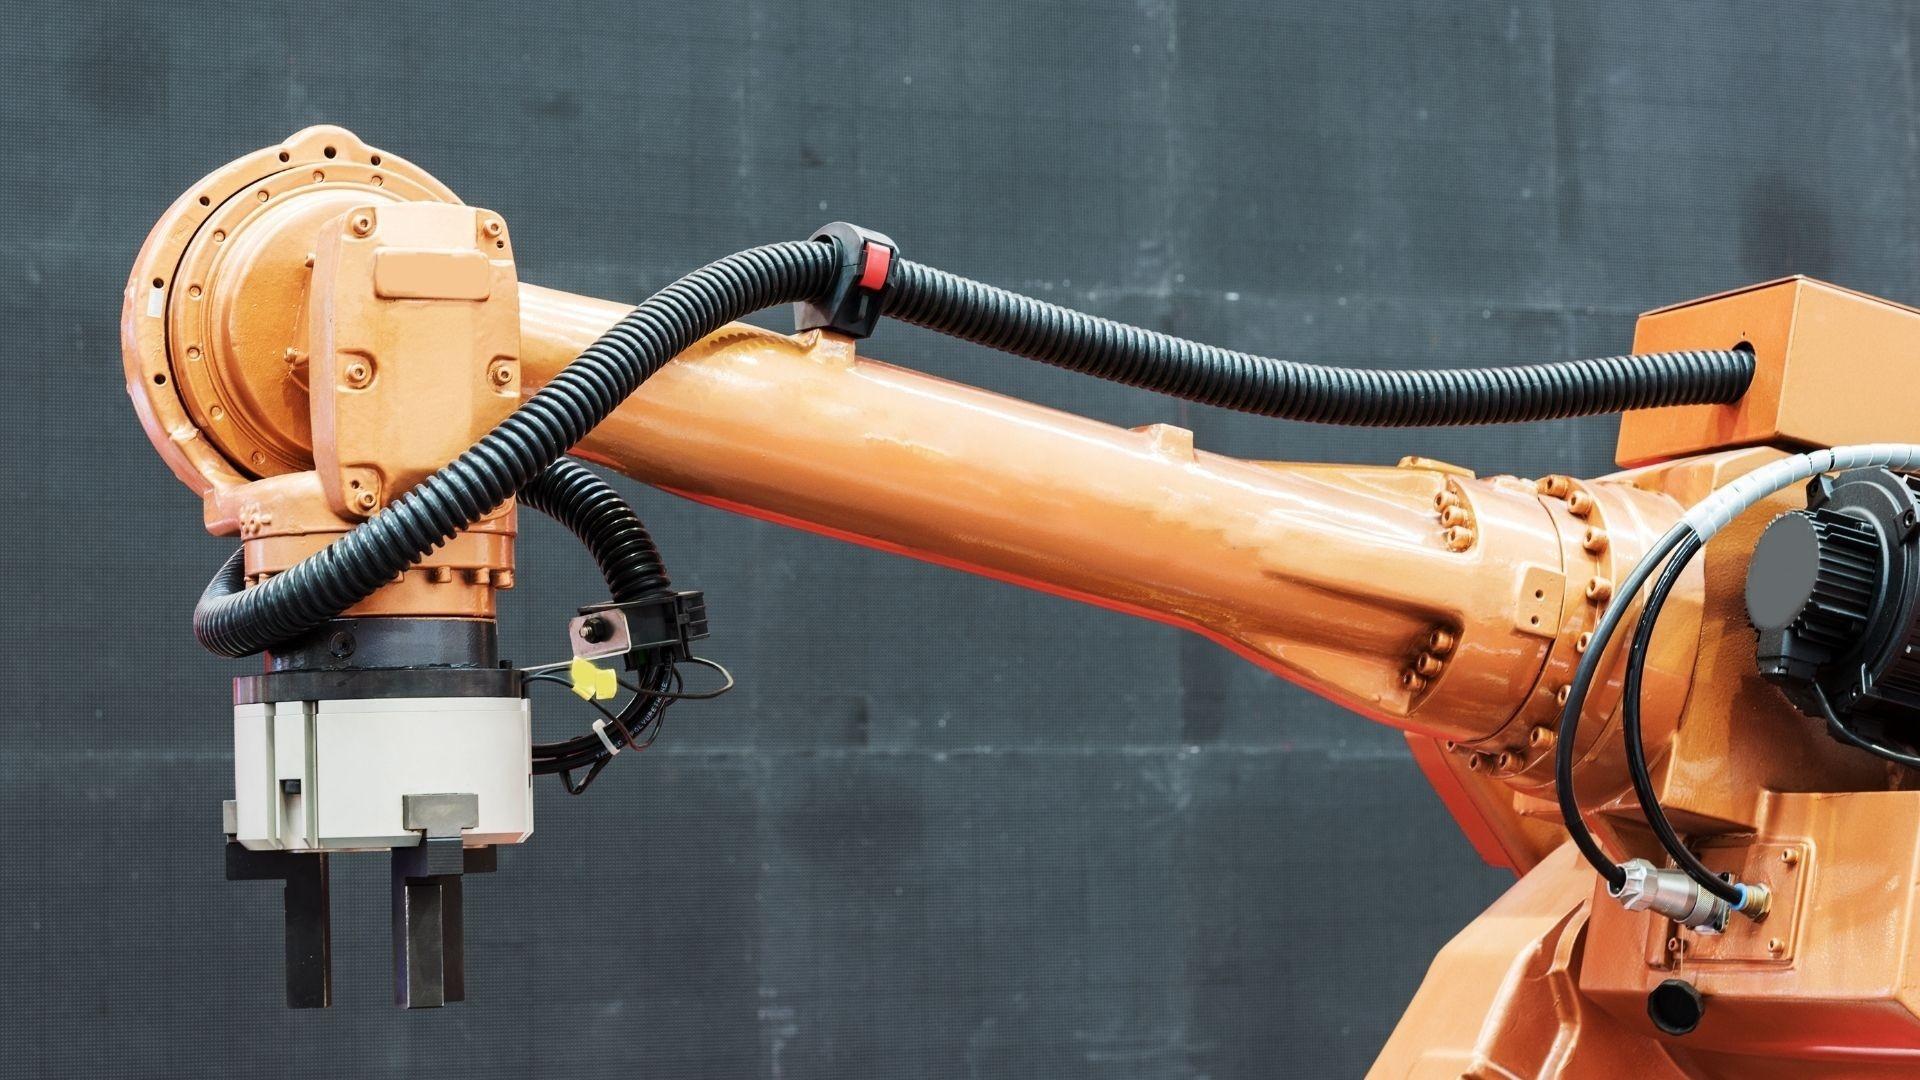 Futurly | Robotics | Architecture | KUKA PRC | Course | Workshop